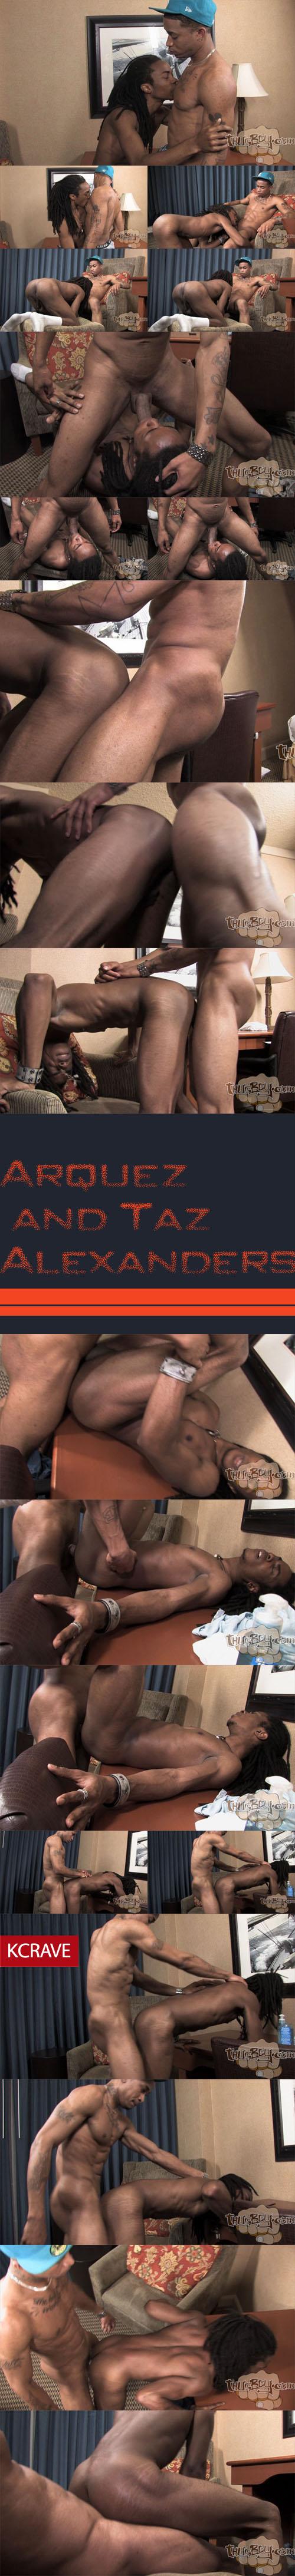 Thugboy - Arquez and Taz Alexanders